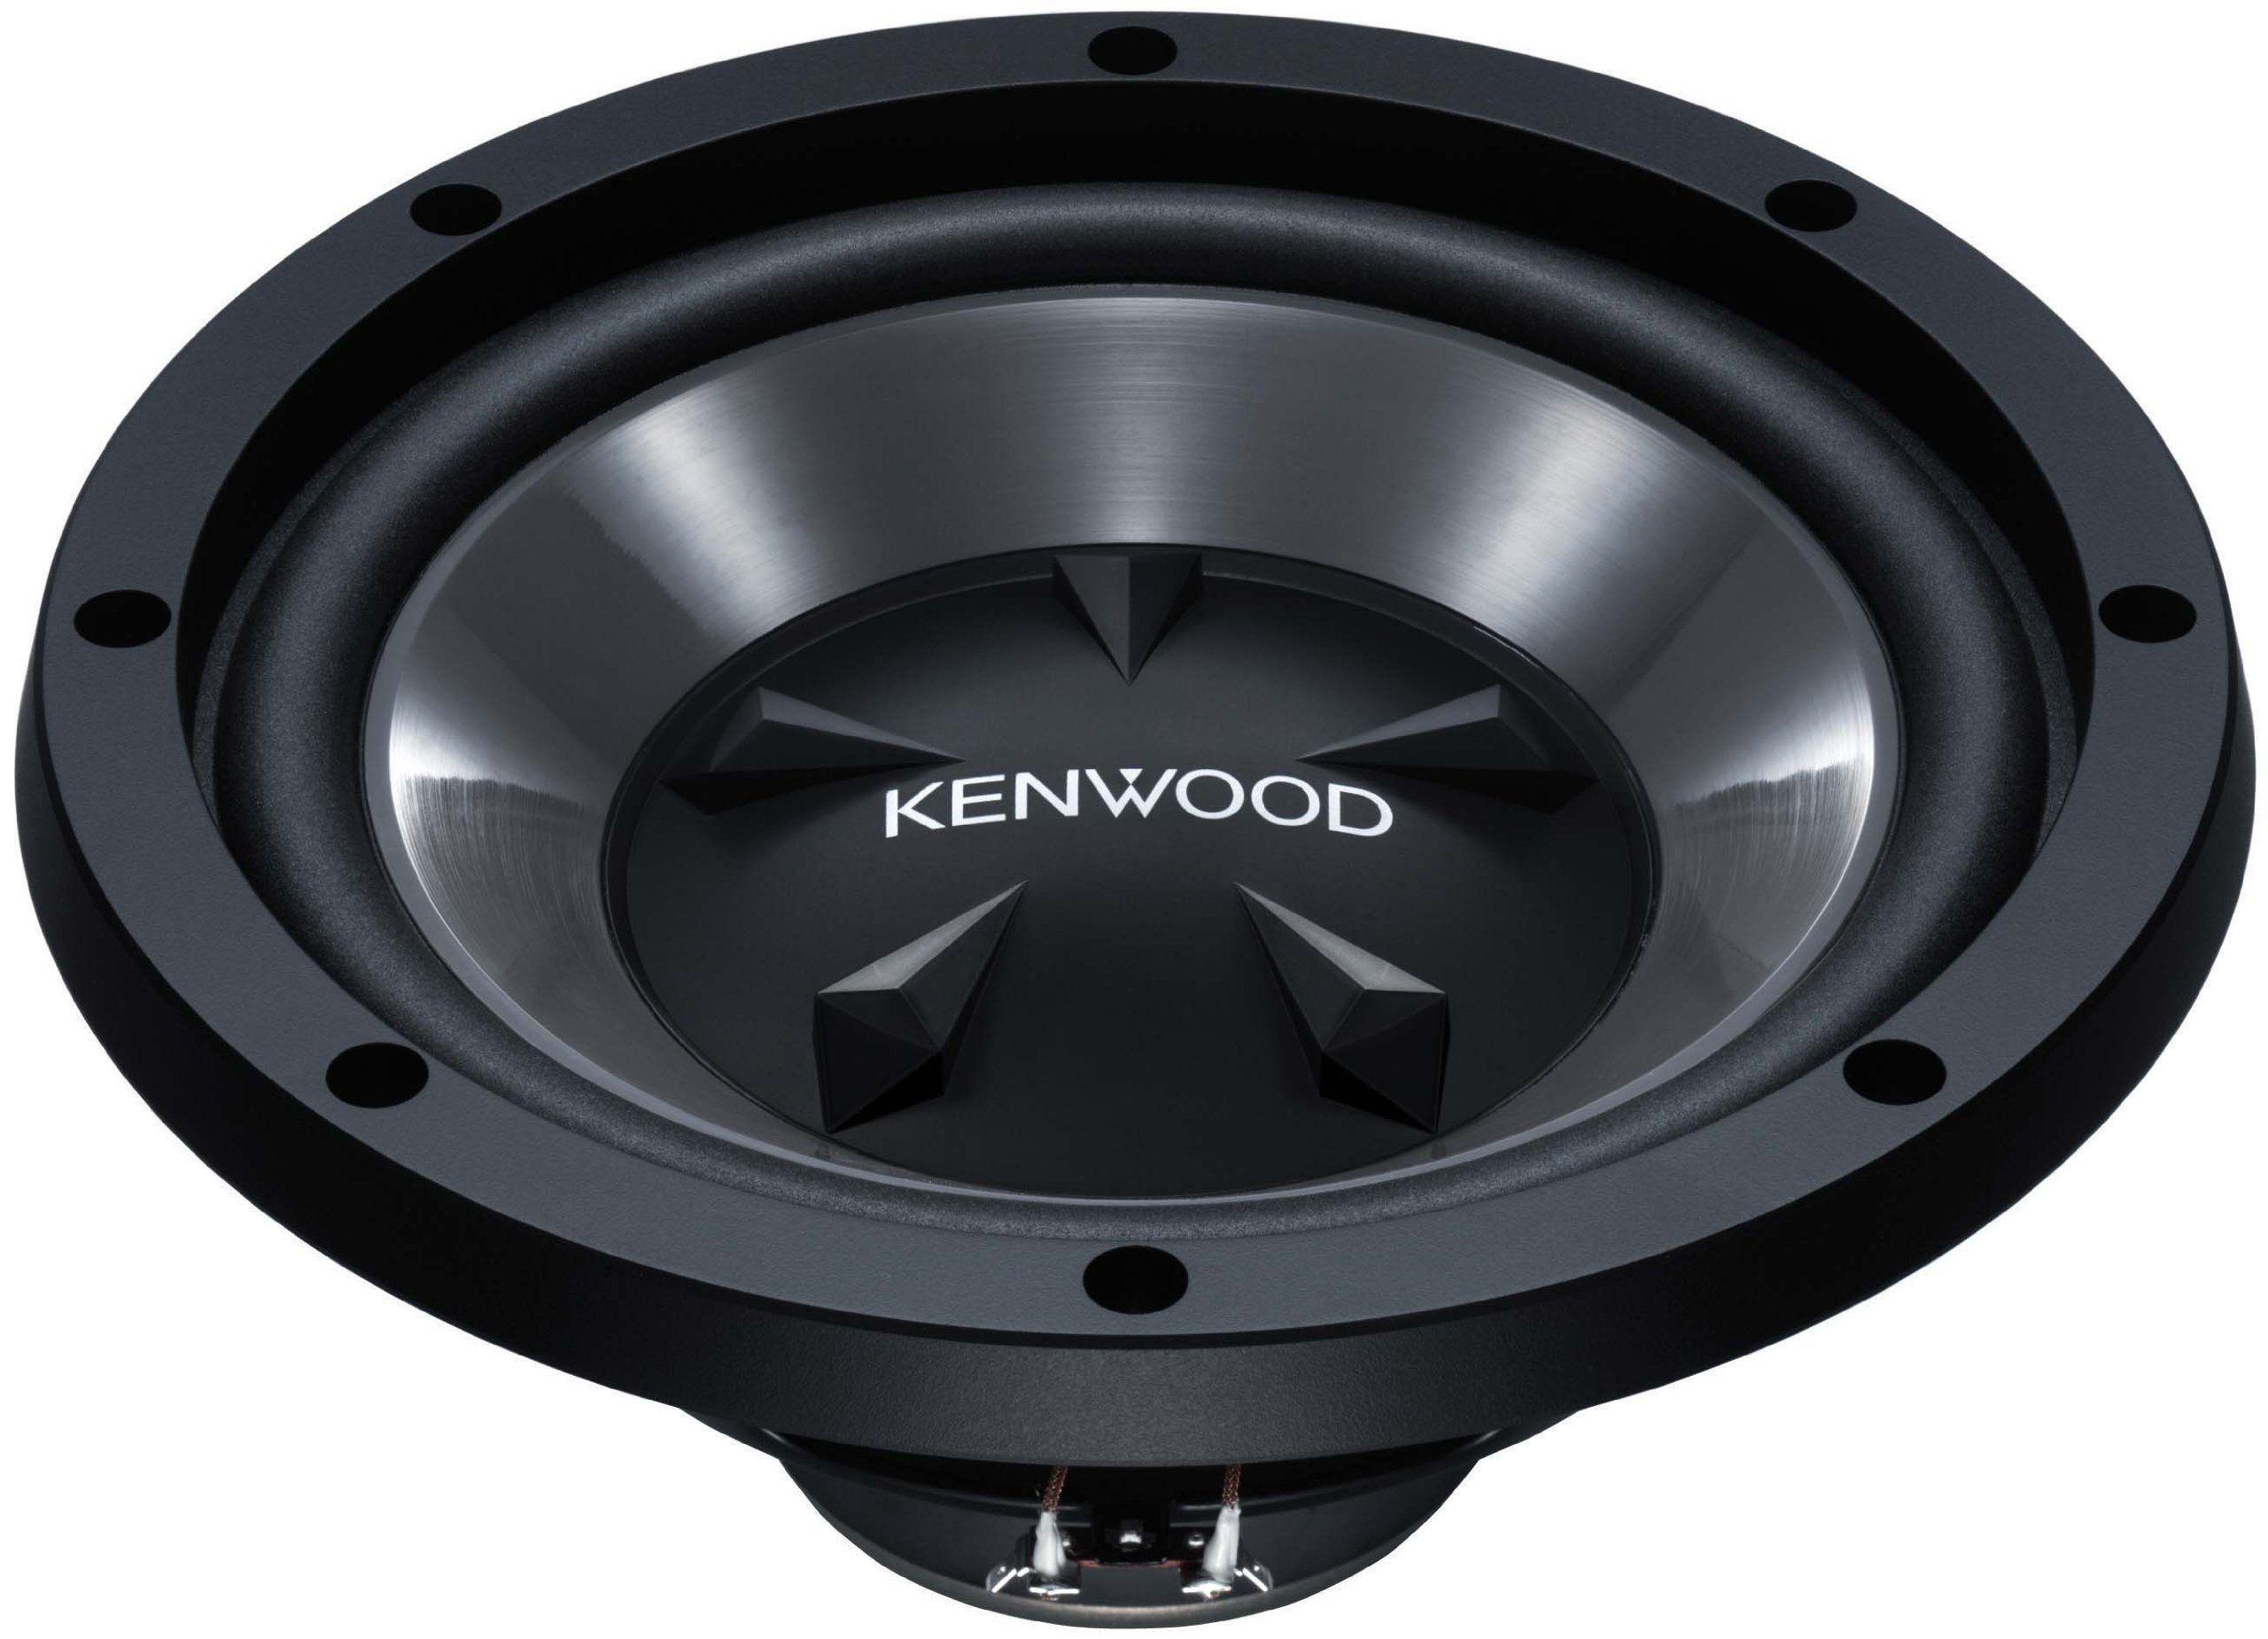 Kenwood Kfc W112s 12 Inch 800w Max Power Subwoofer Set Of 1 Car Amplifier